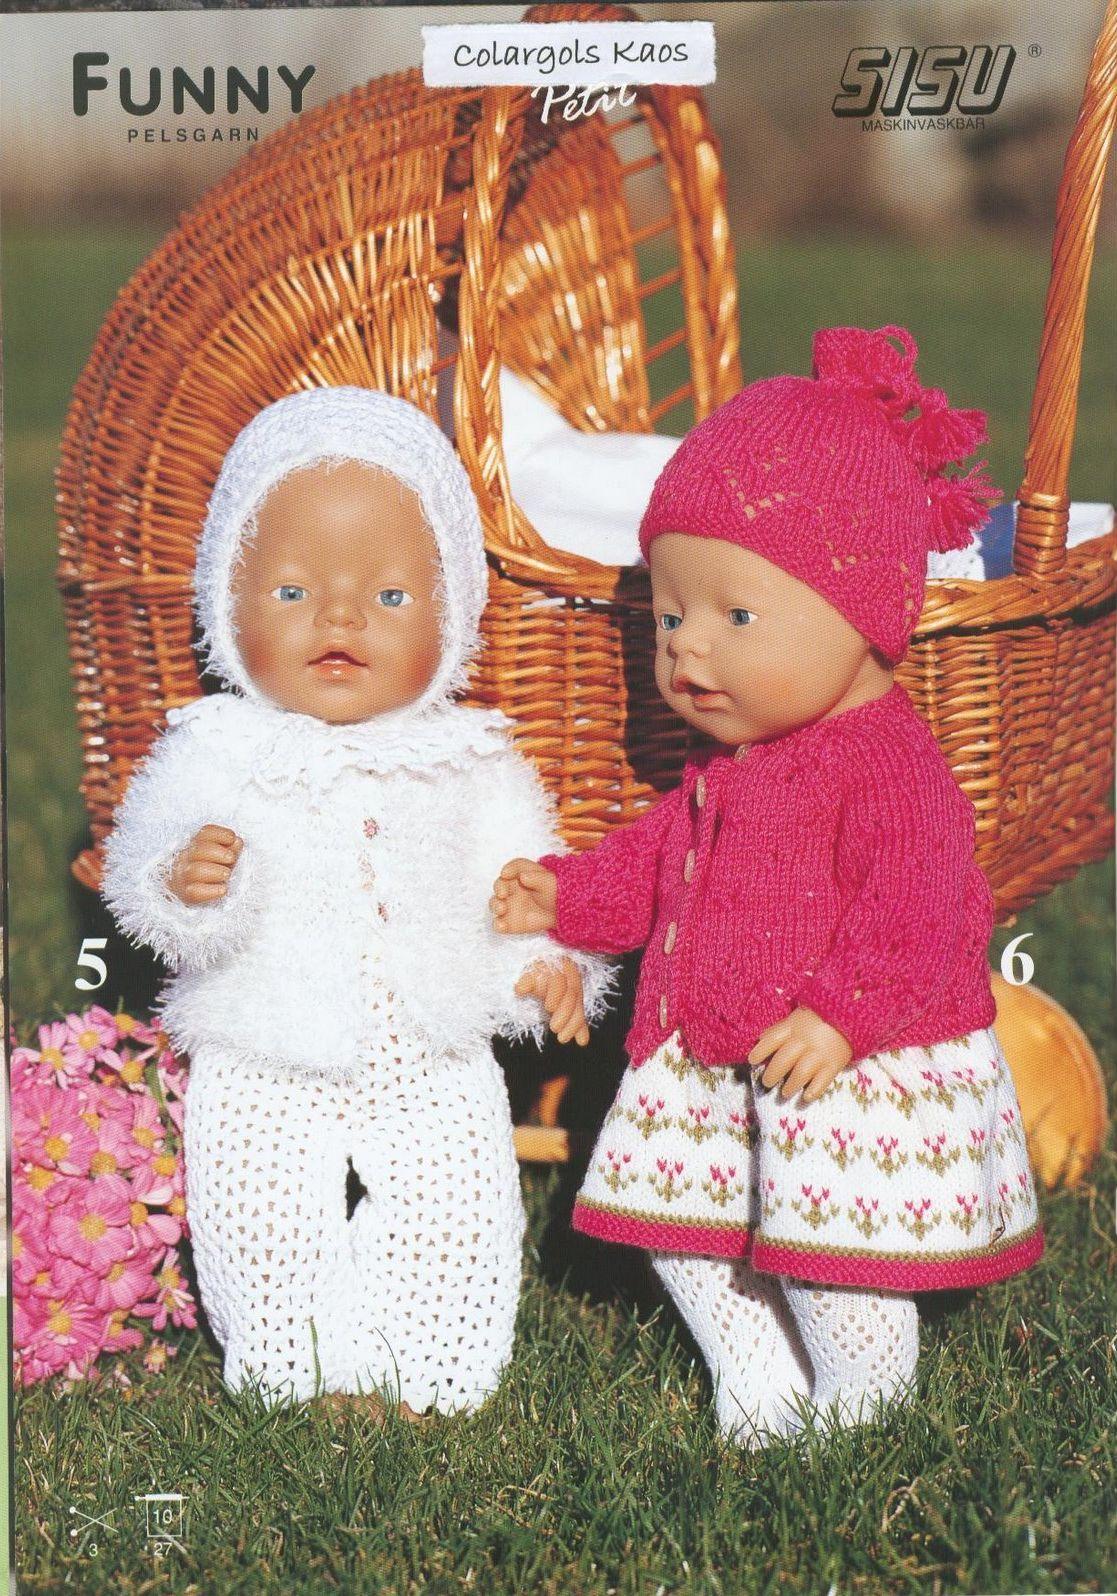 Album - Google+ | Одежда для кукол | Pinterest | Album, Dolls and ...